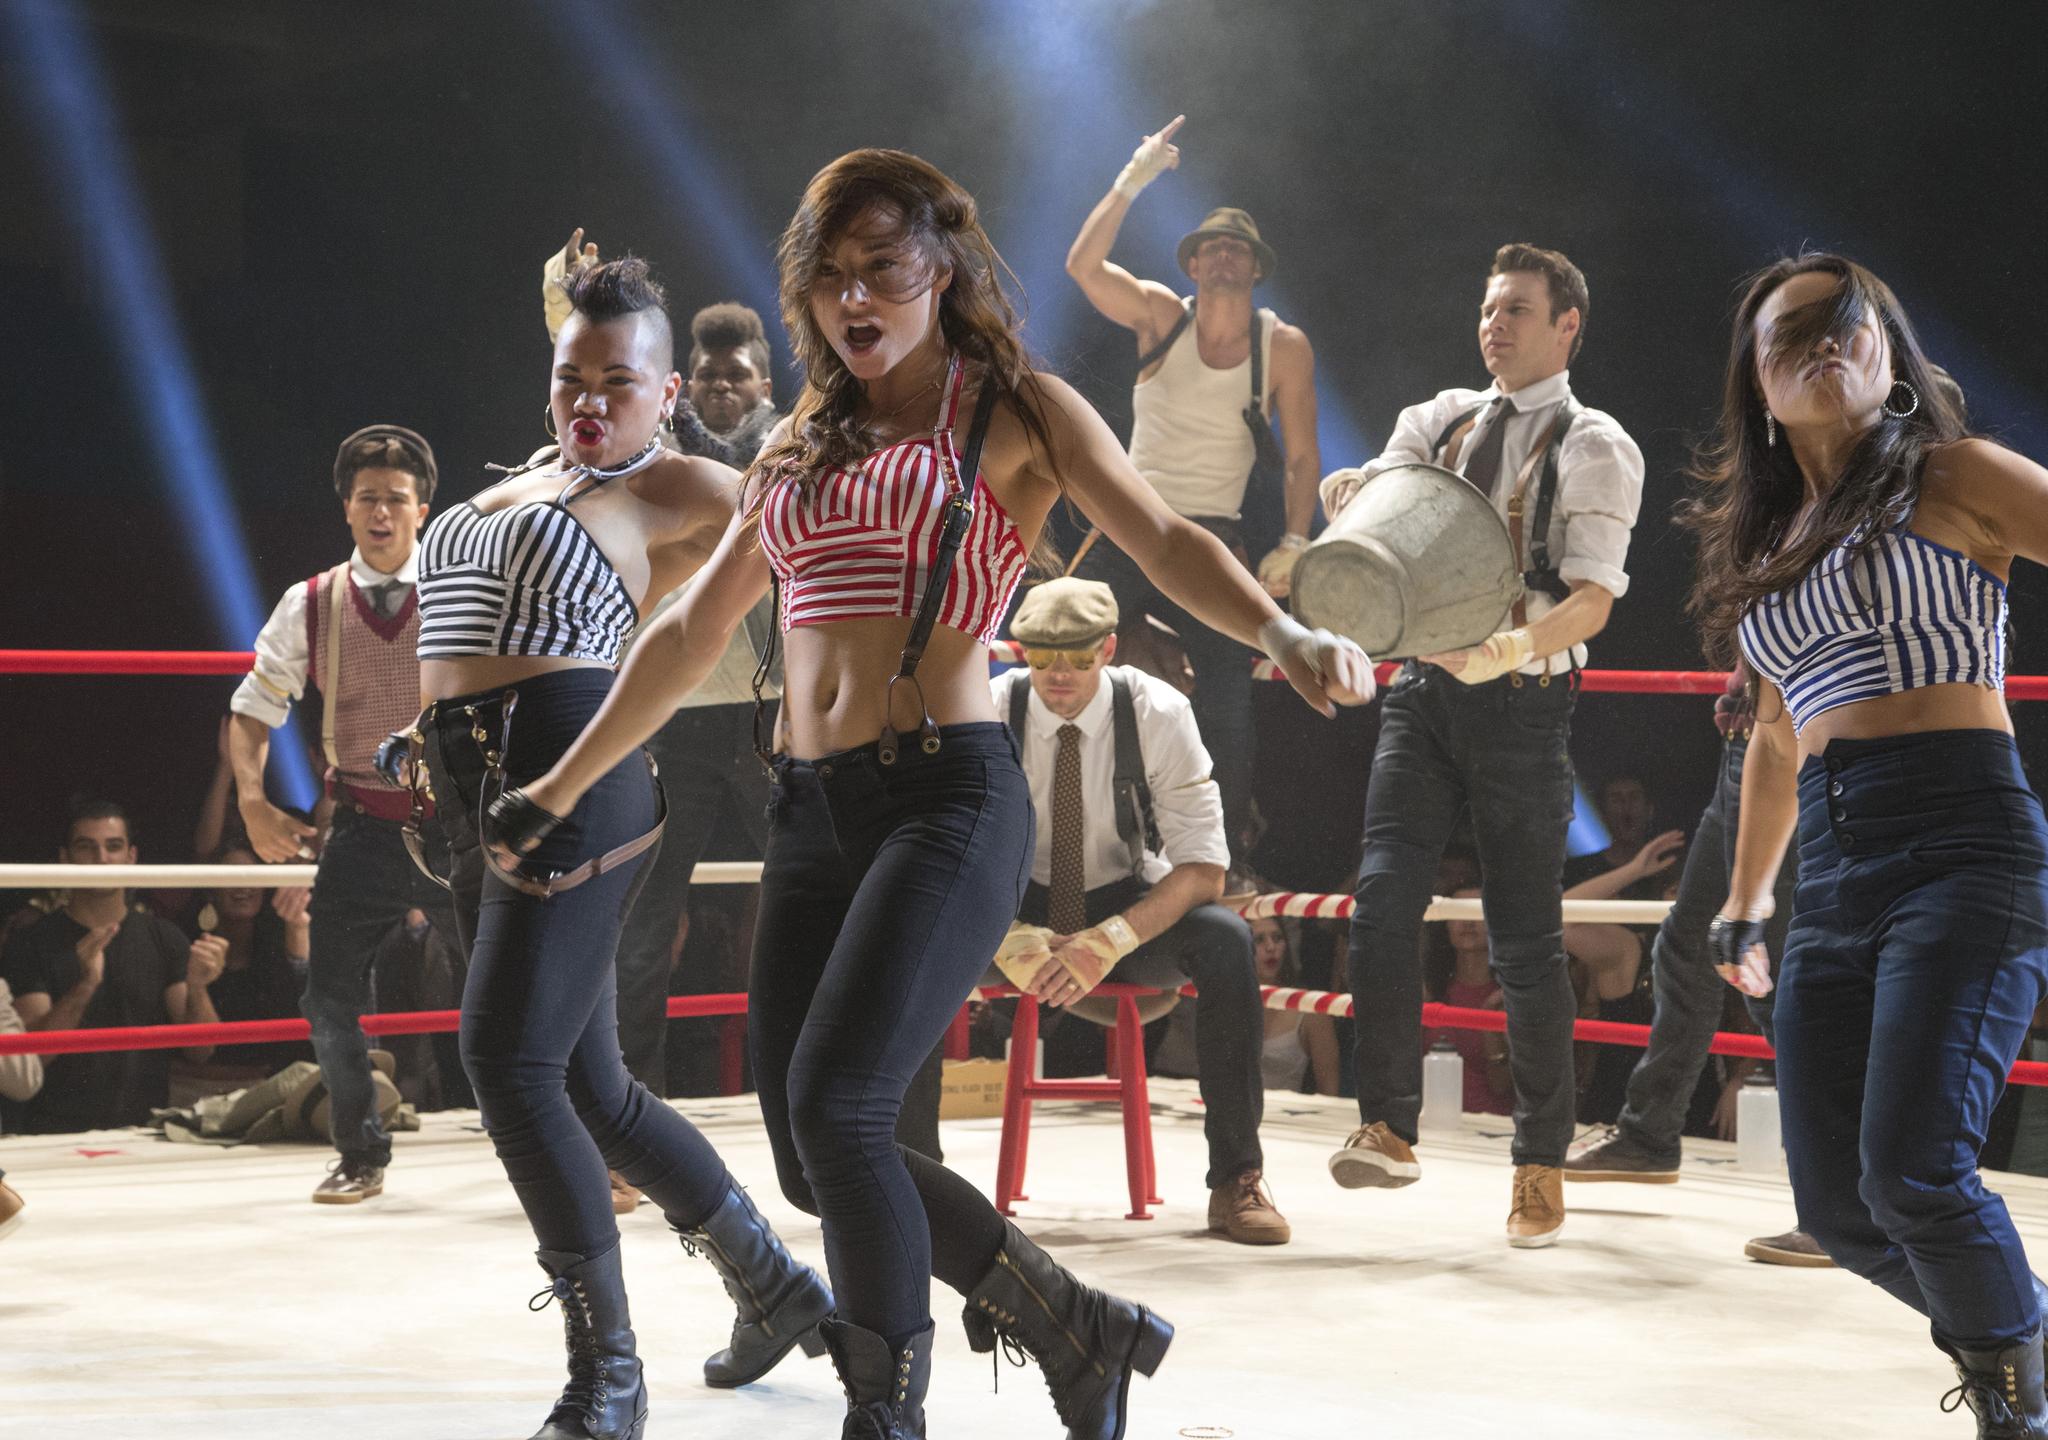 шаг вперед картинки про танец